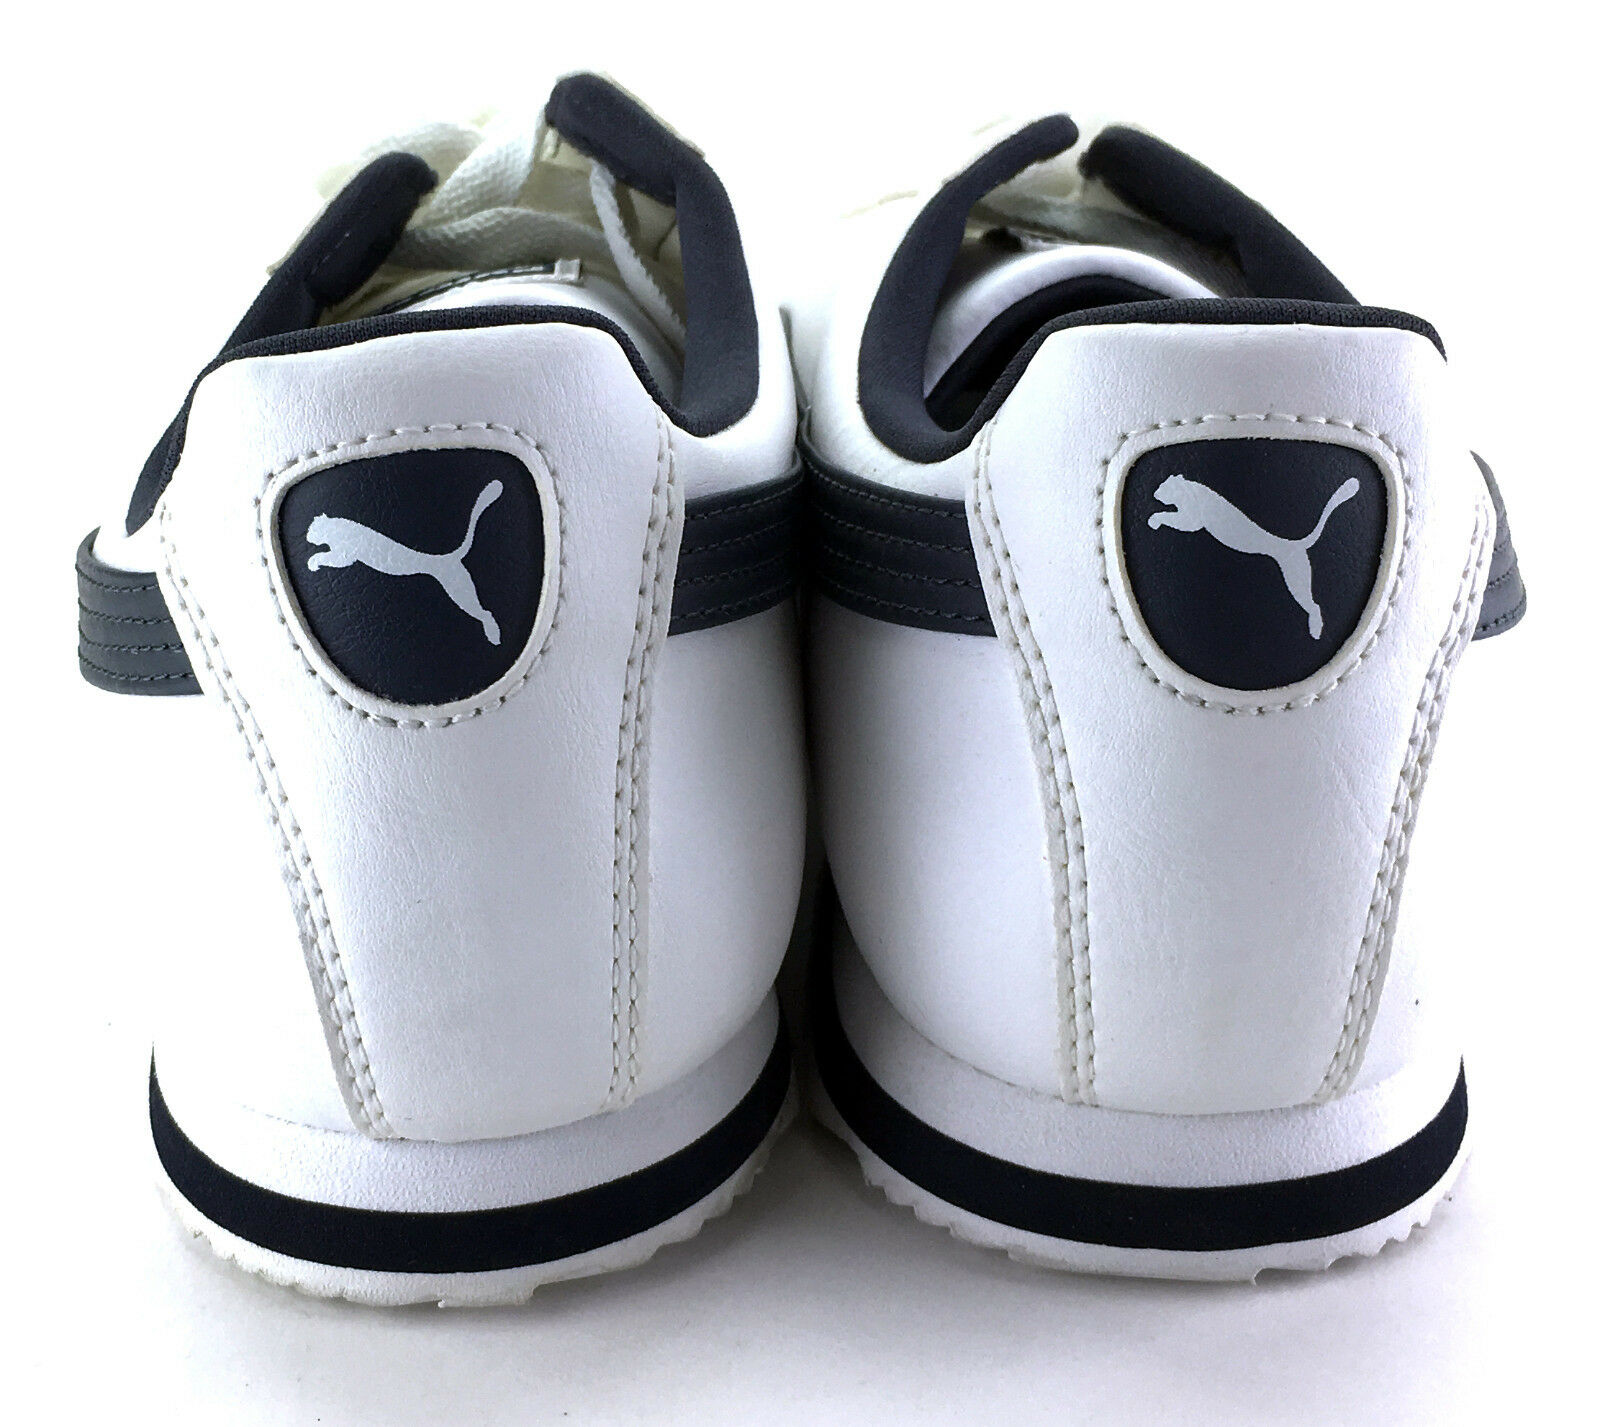 buy online bb5db a0342 ... Puma Shoes Roma Basic Basic Basic Retro White Black Sneakers Size 10  dc1c5e ...